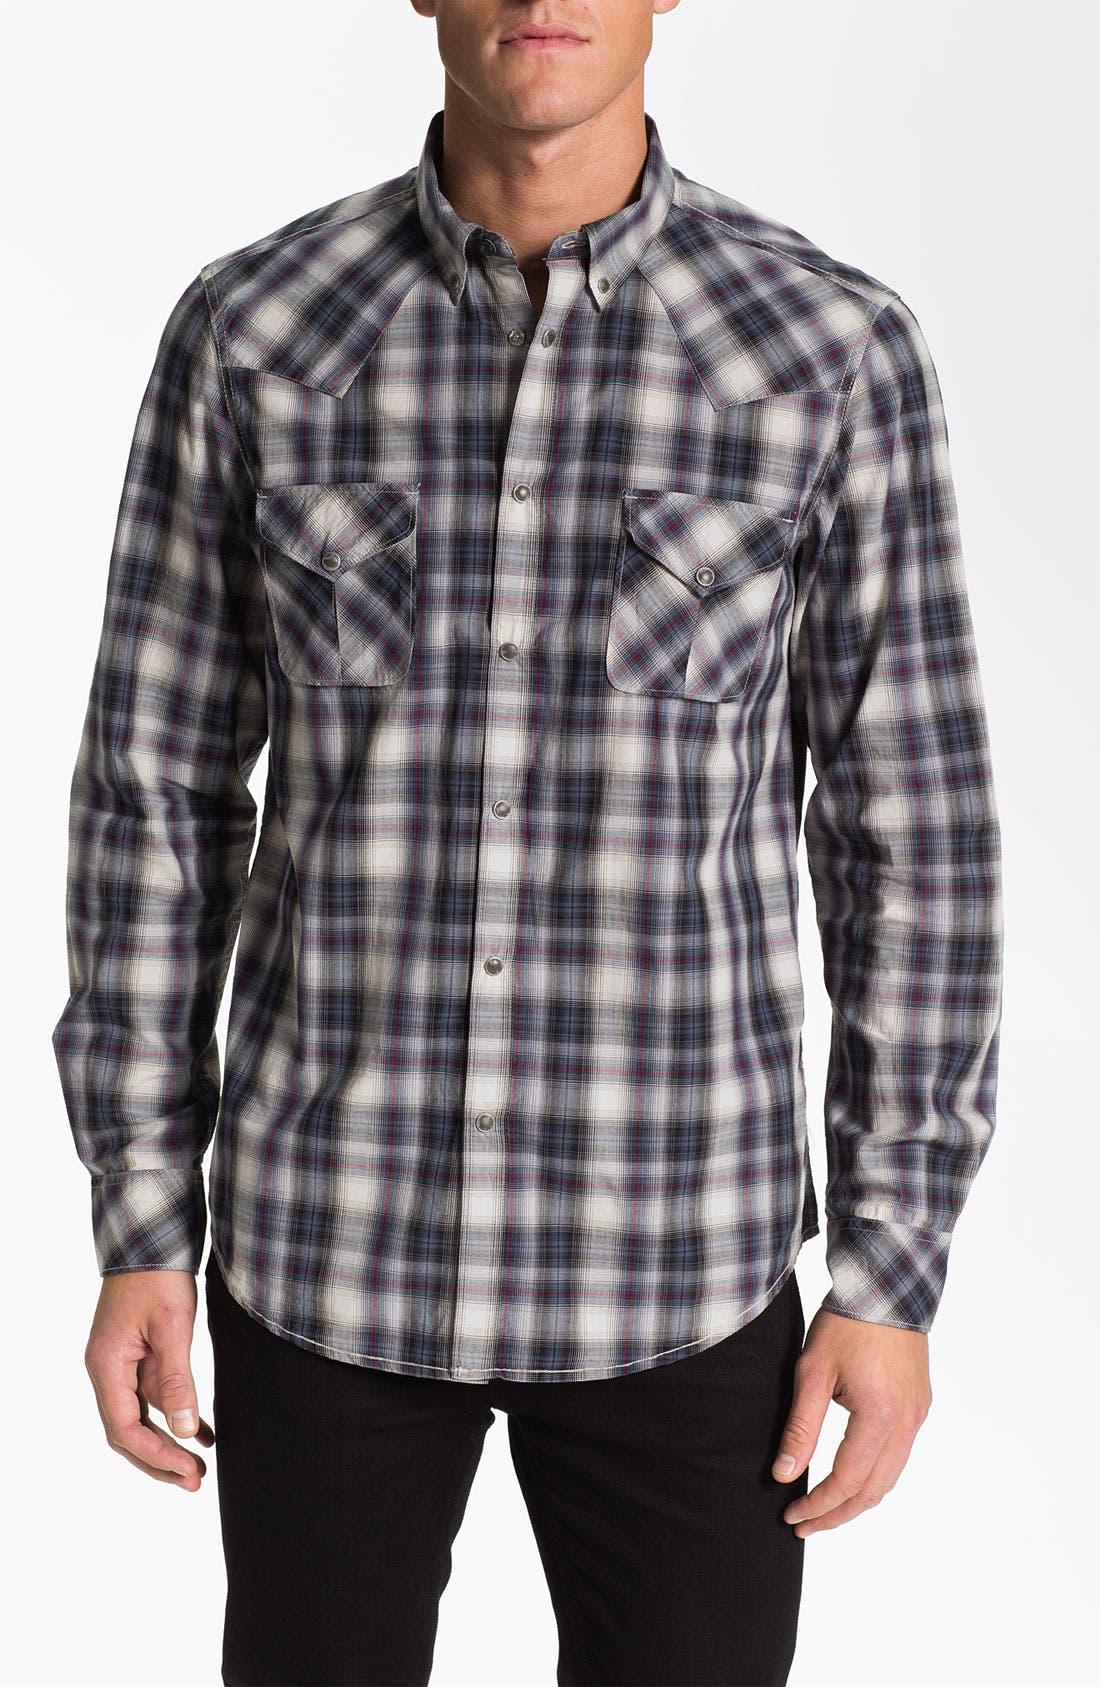 Alternate Image 1 Selected - Ben Sherman 'Clerkenwell' Plaid Woven Shirt